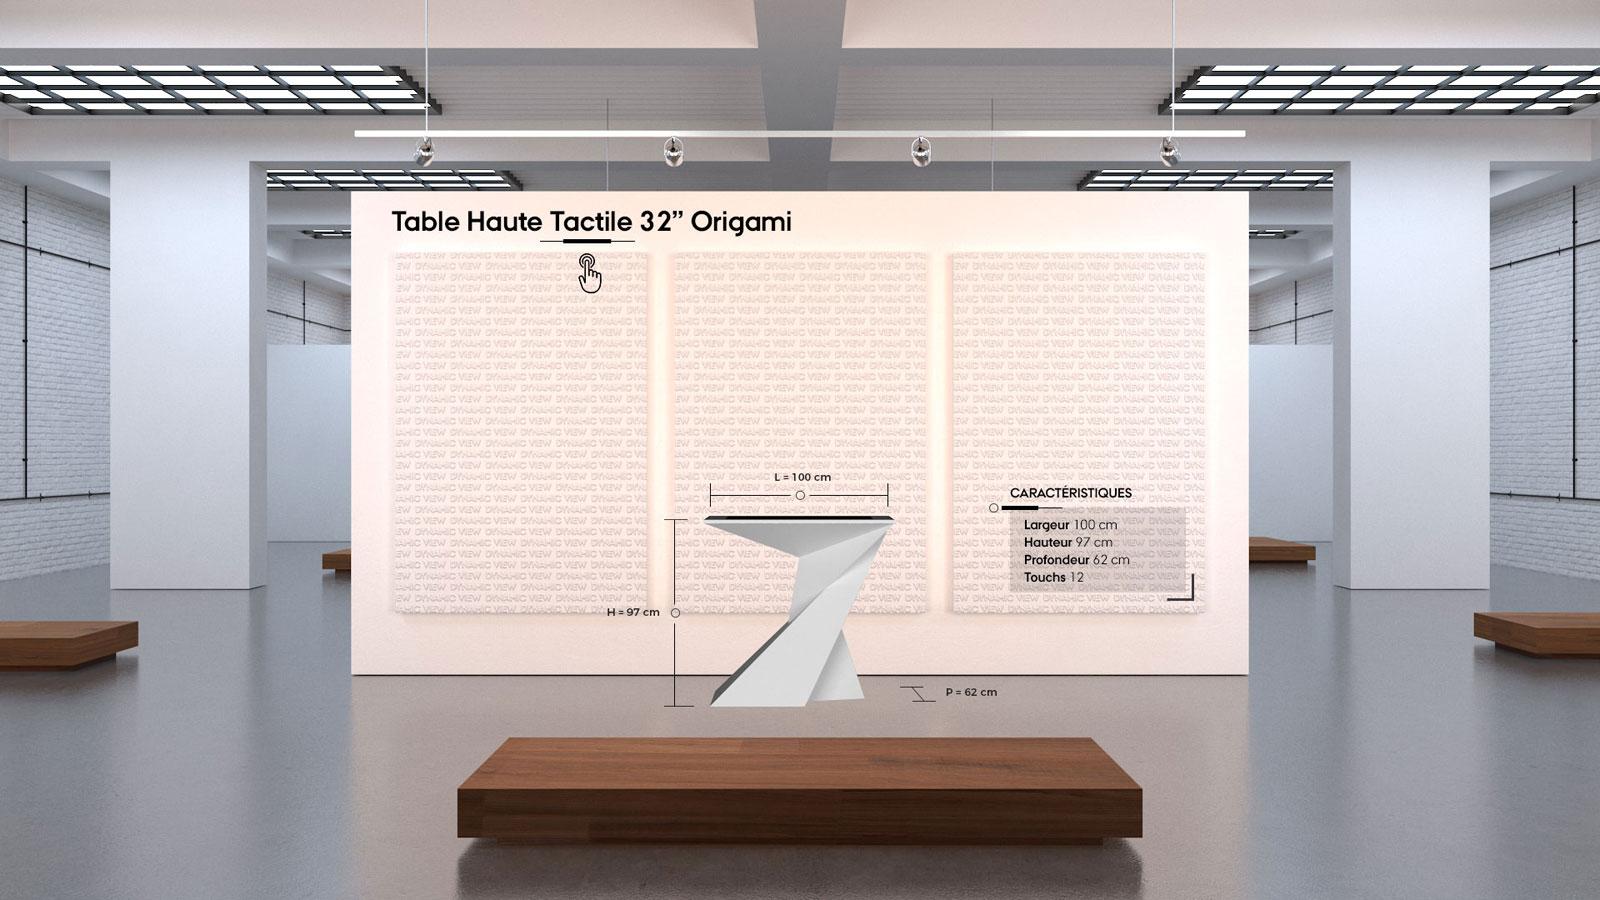 35 Table Haute Tactile 32'' Origami